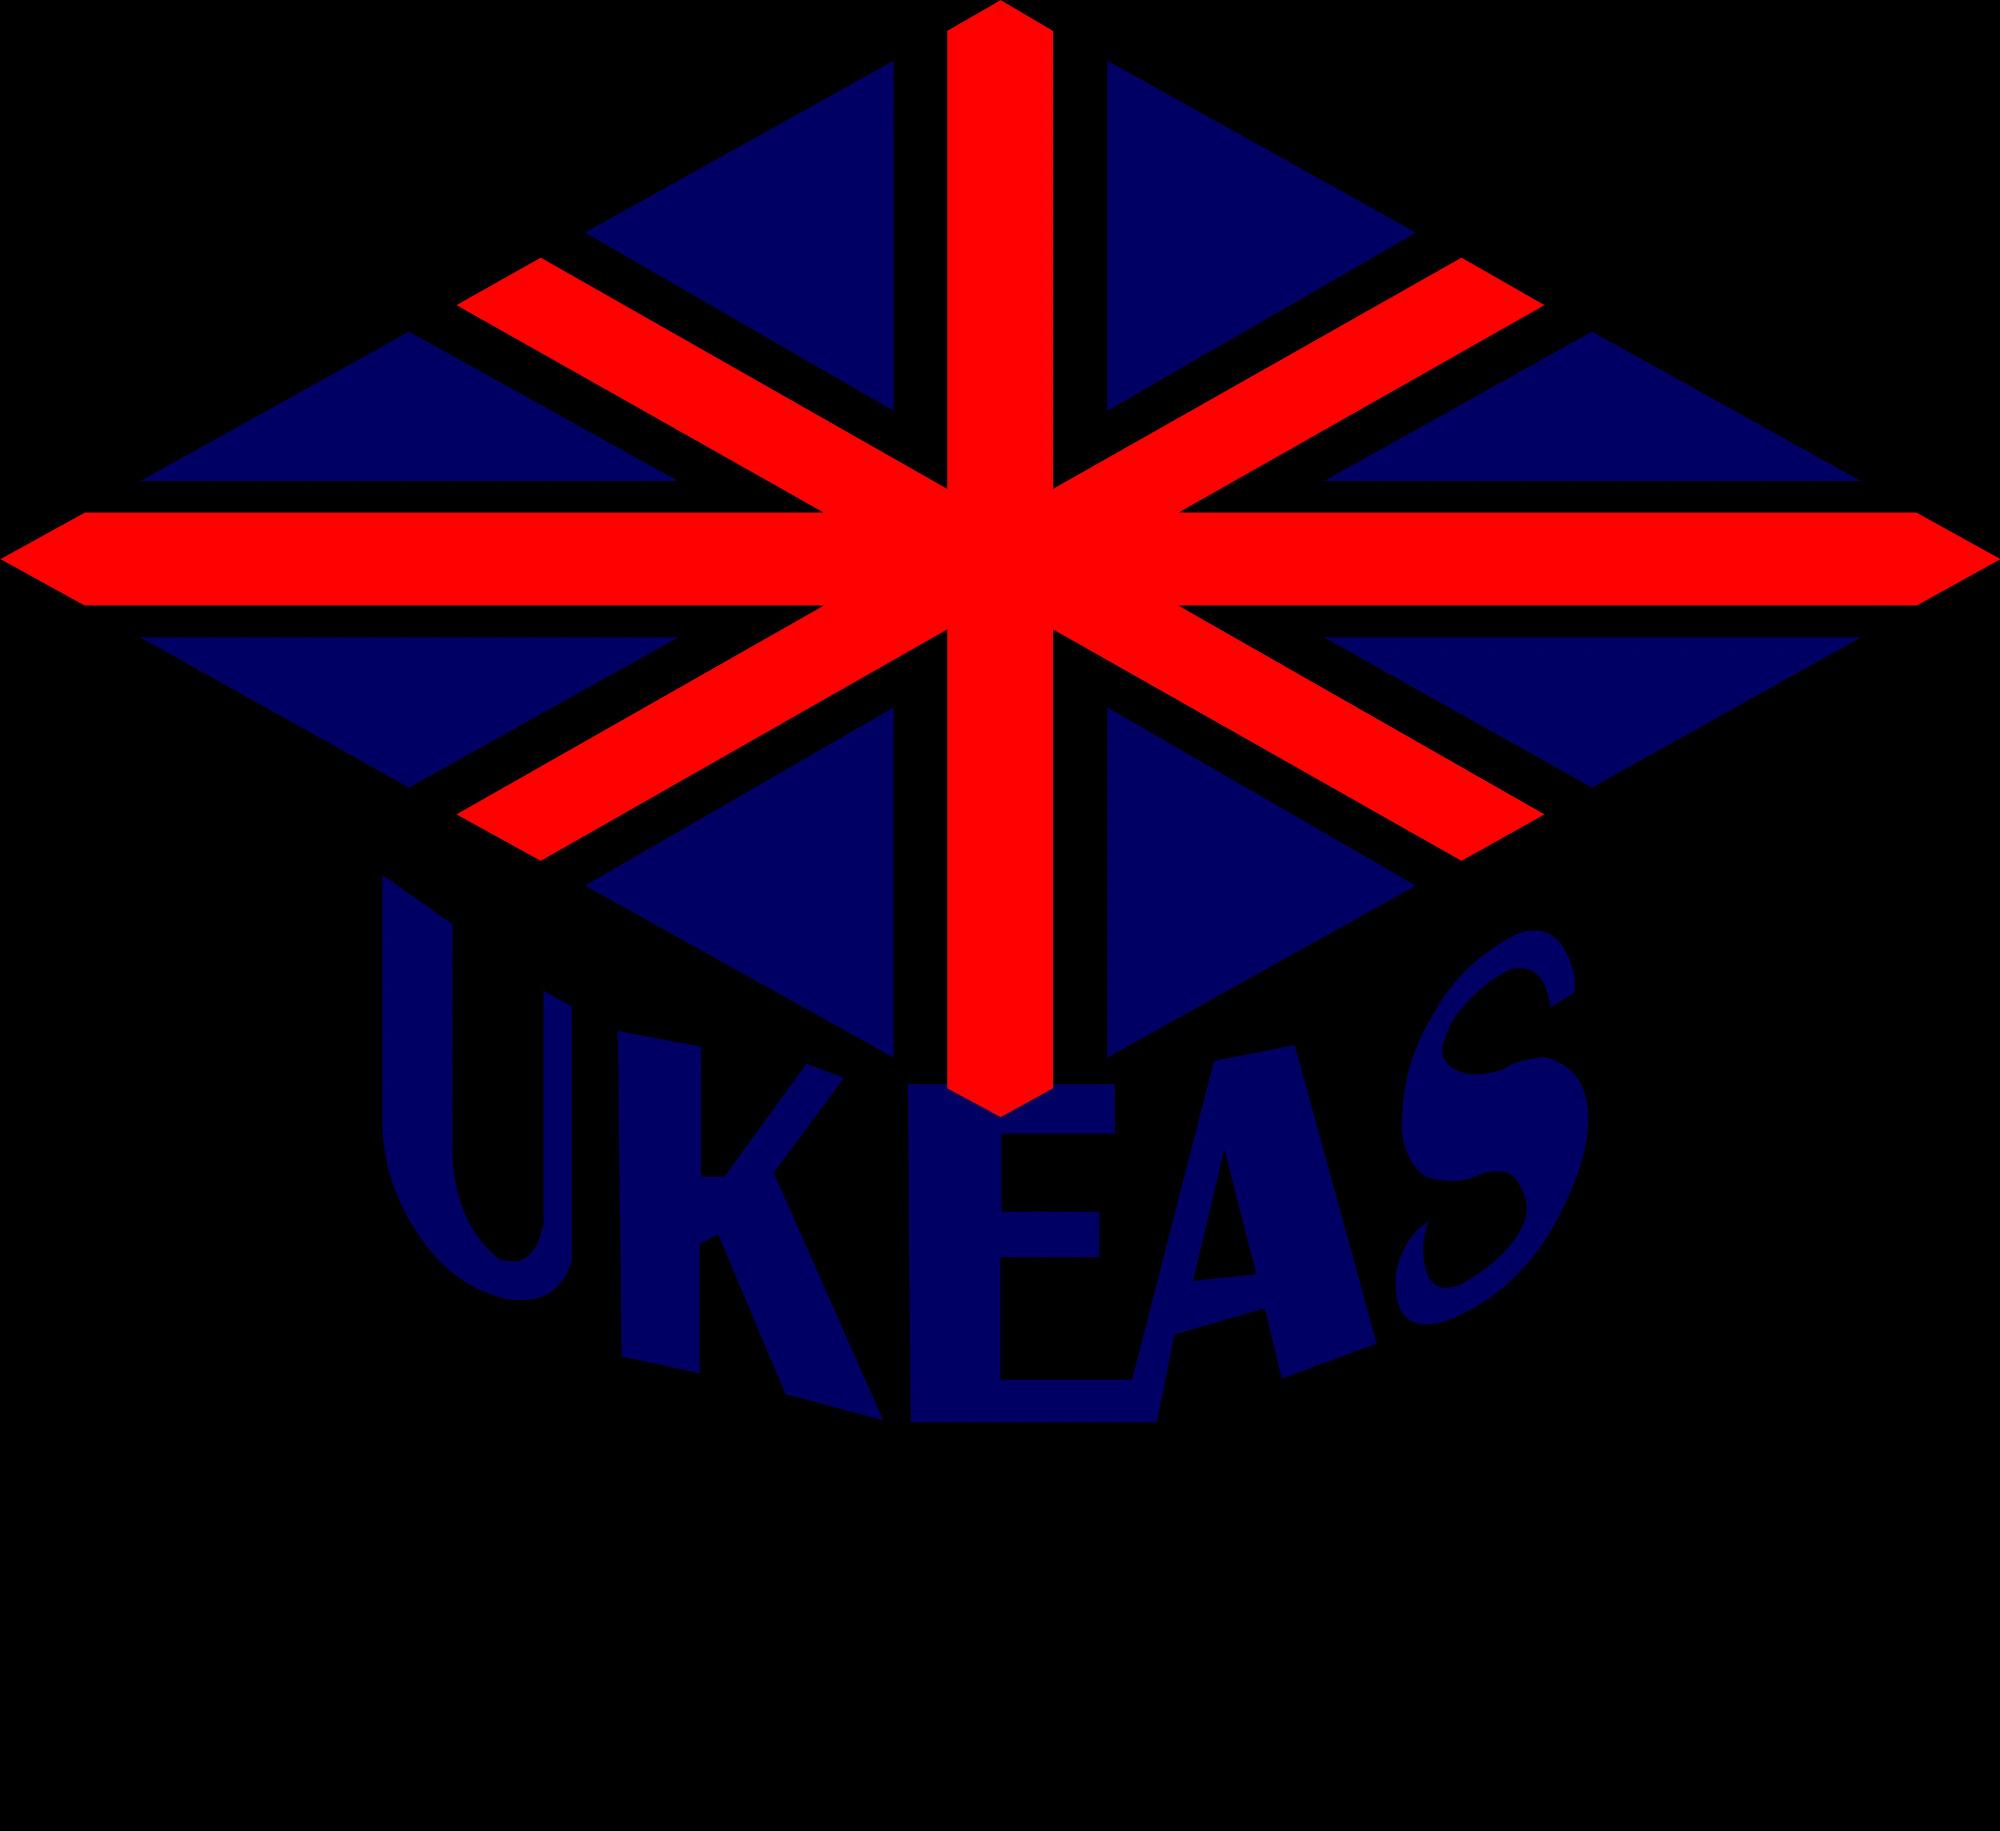 Marketing Manager at UKEAS Nigeria